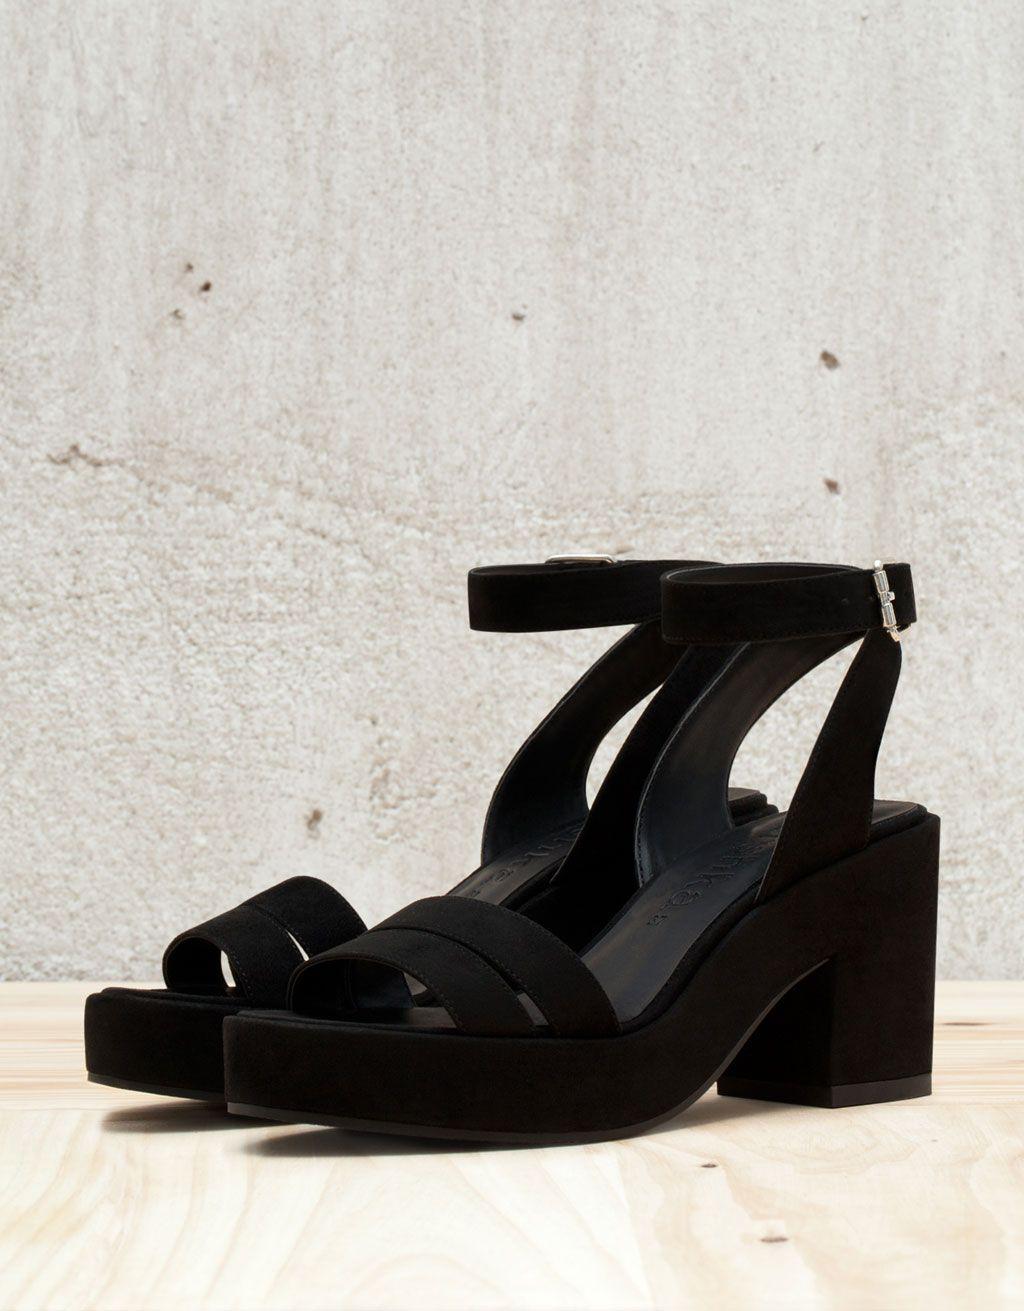 36be46fc69b6 Bershka Malaysia - BSK strappy low heel sandals